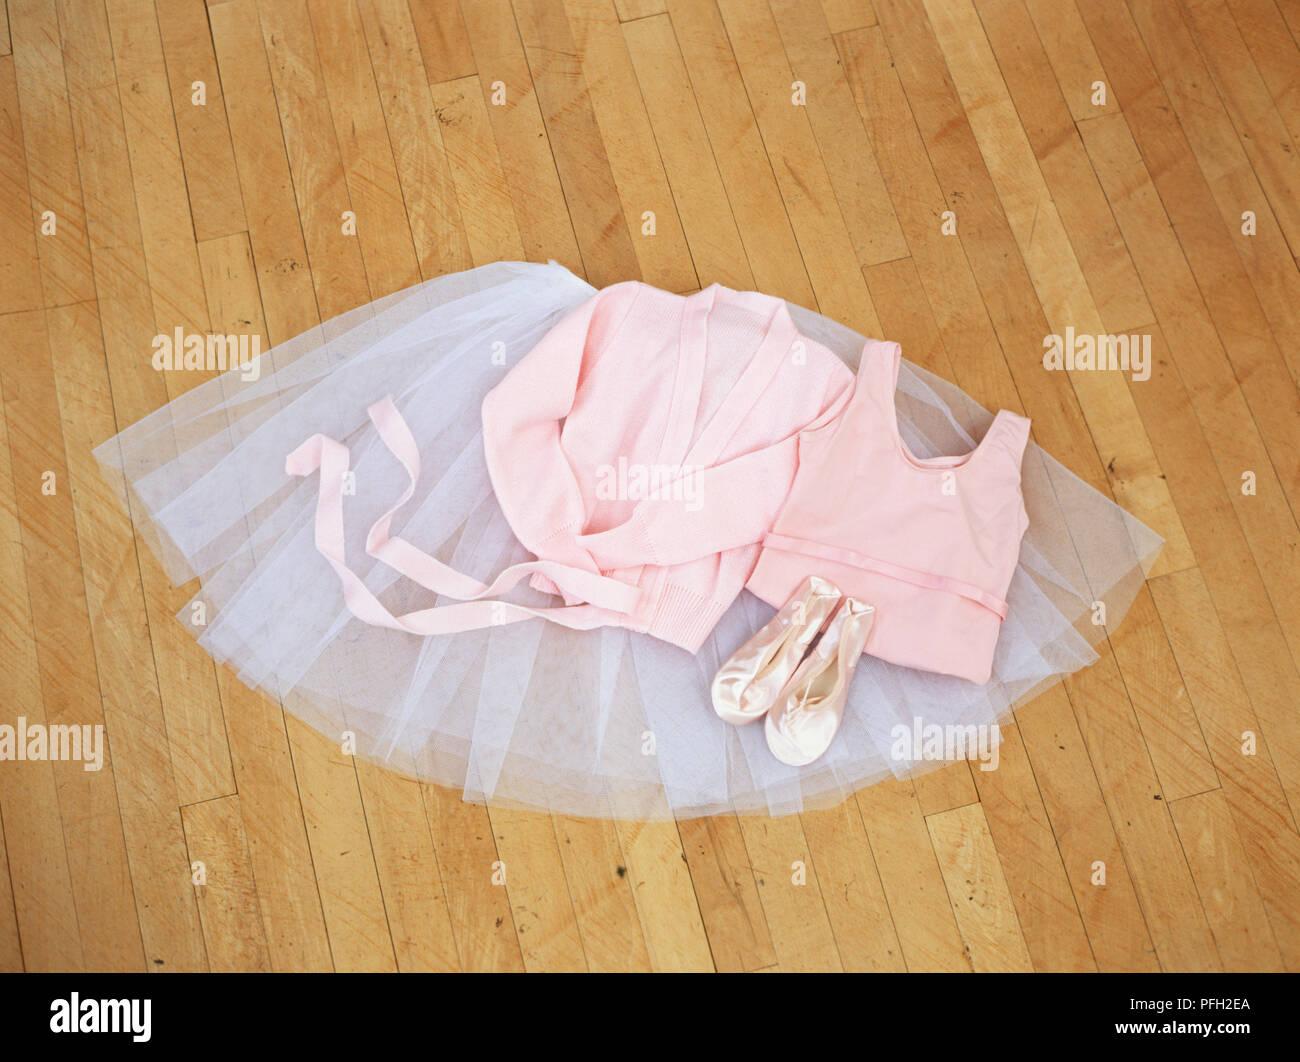 Ballet Dancers Clothes Lying On Floor Tutu Wrap Around Cardigan